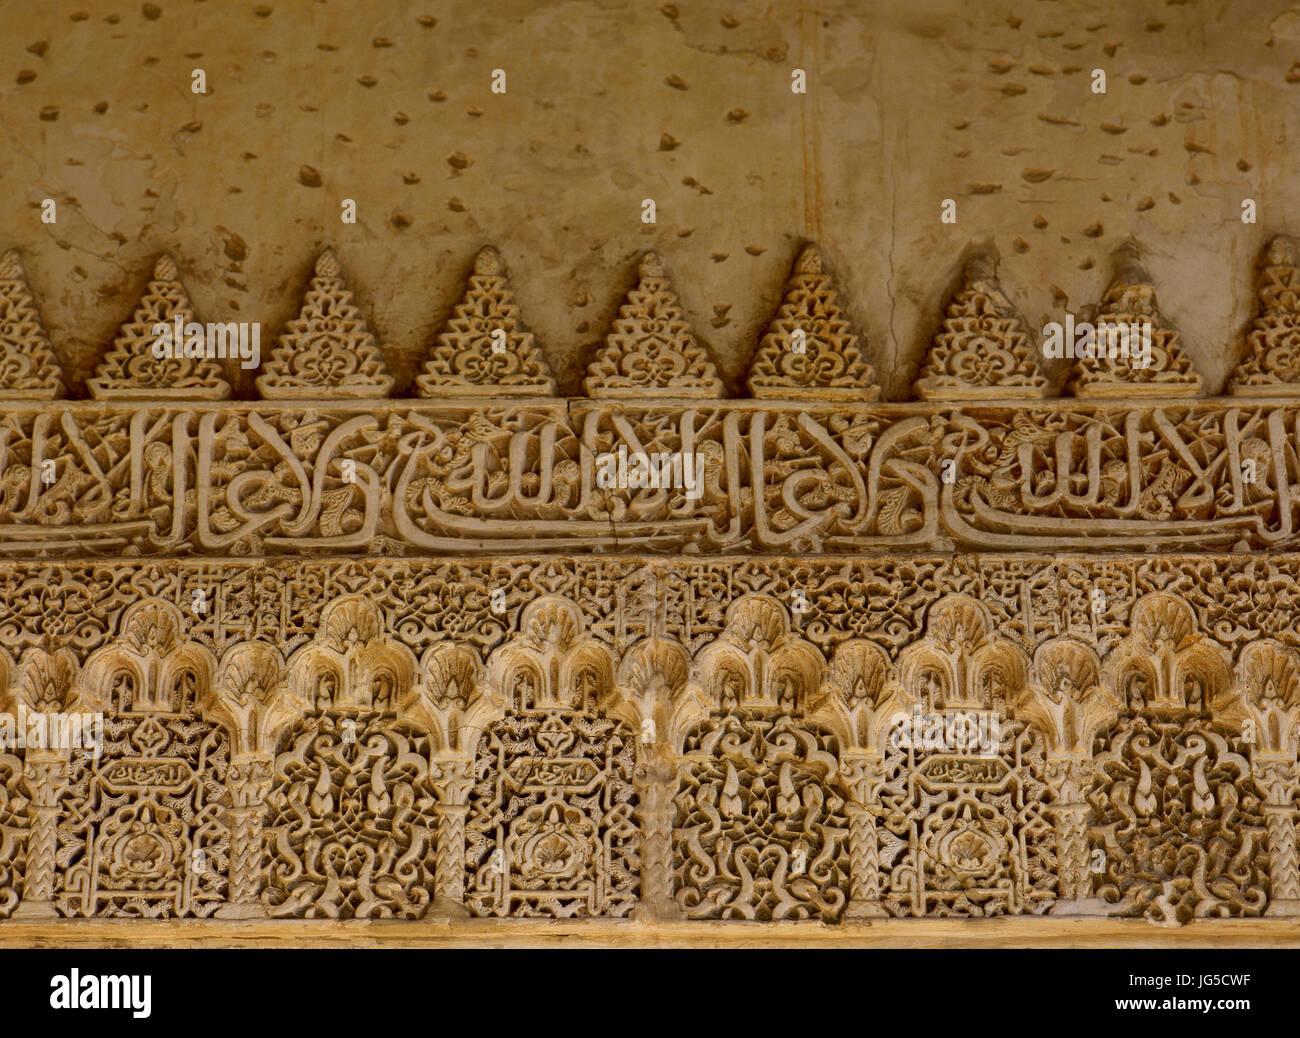 Generalife Palace. Emirate of Granada, Al-Andalus. Built 14th century. The court of la Acequia. Arabesque stucco. - Stock Image